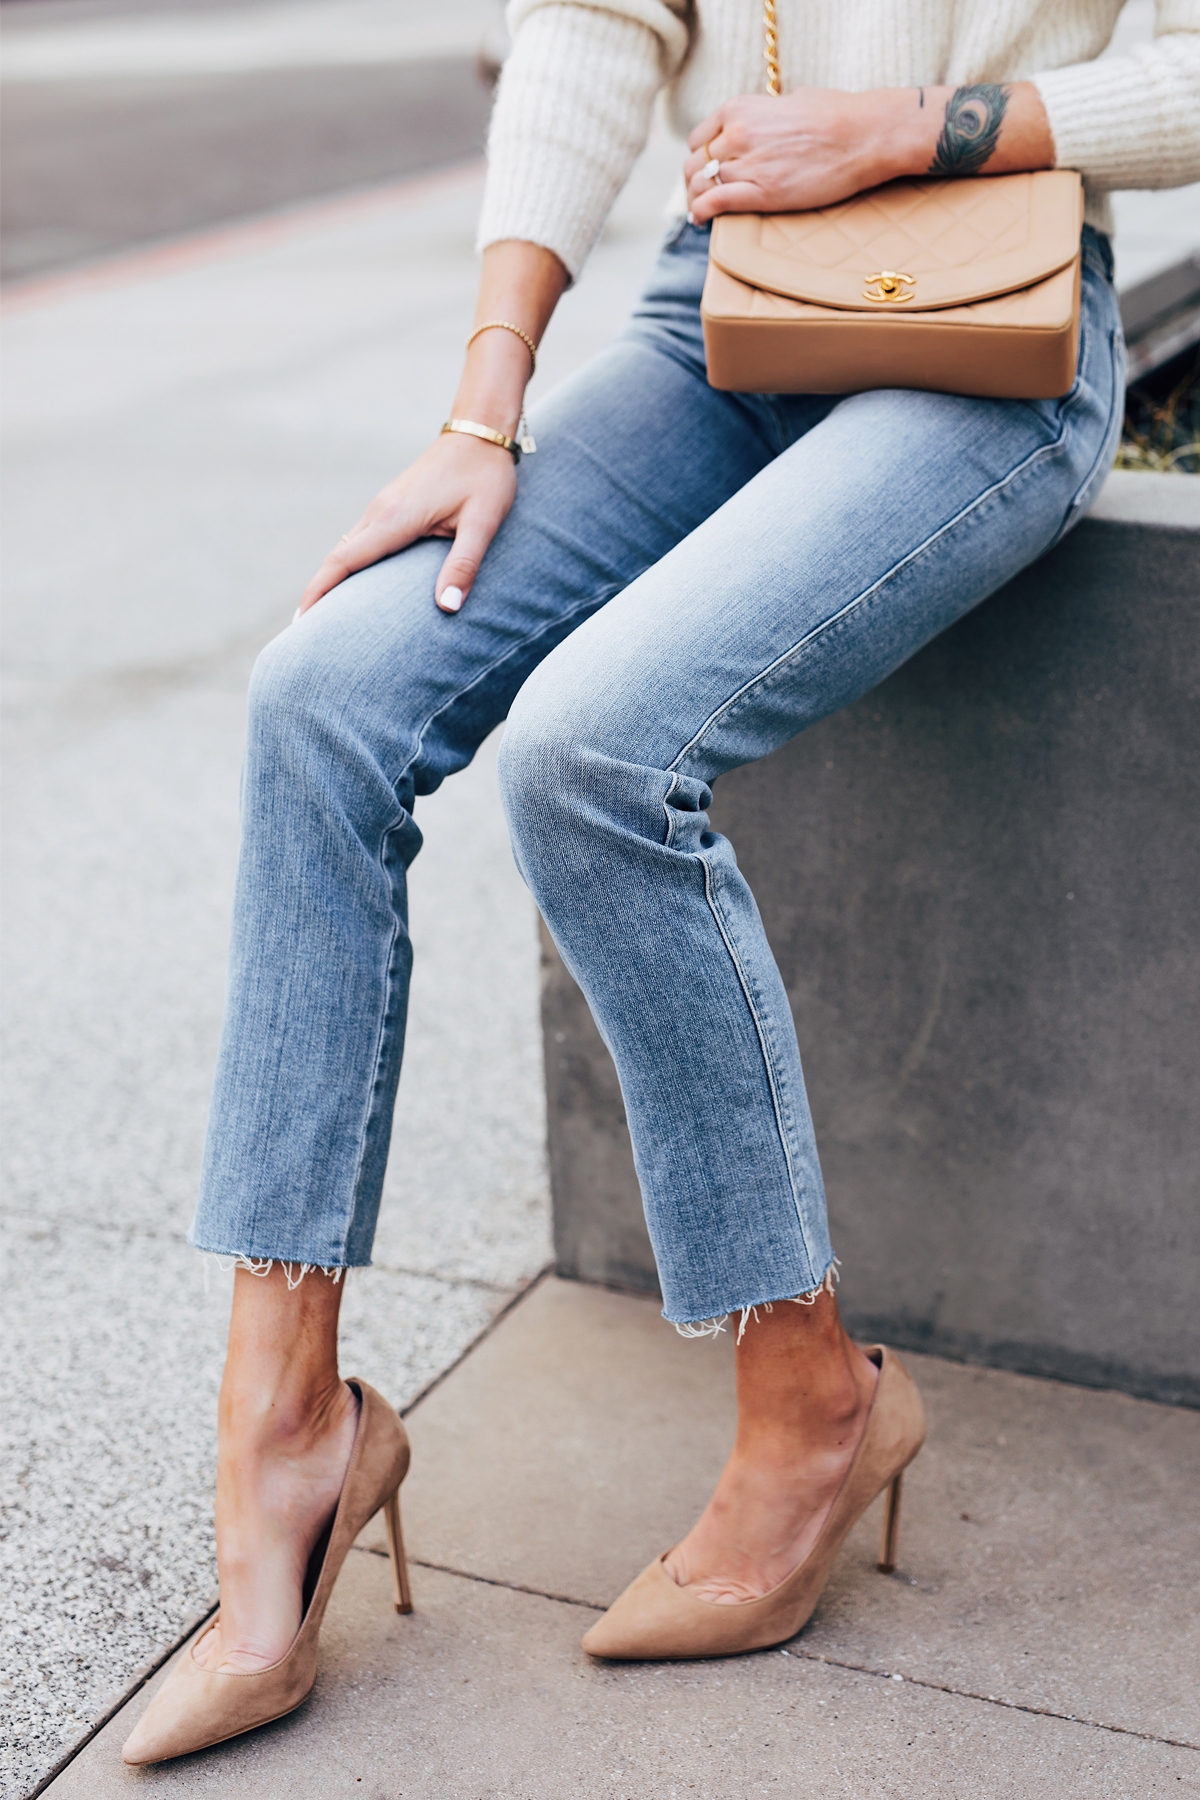 Fashion Jackson Frame Raw Hem Straight Leg Jeans Jimmy Choo Romy Nude Pumps Chanel Tan Diana Bag